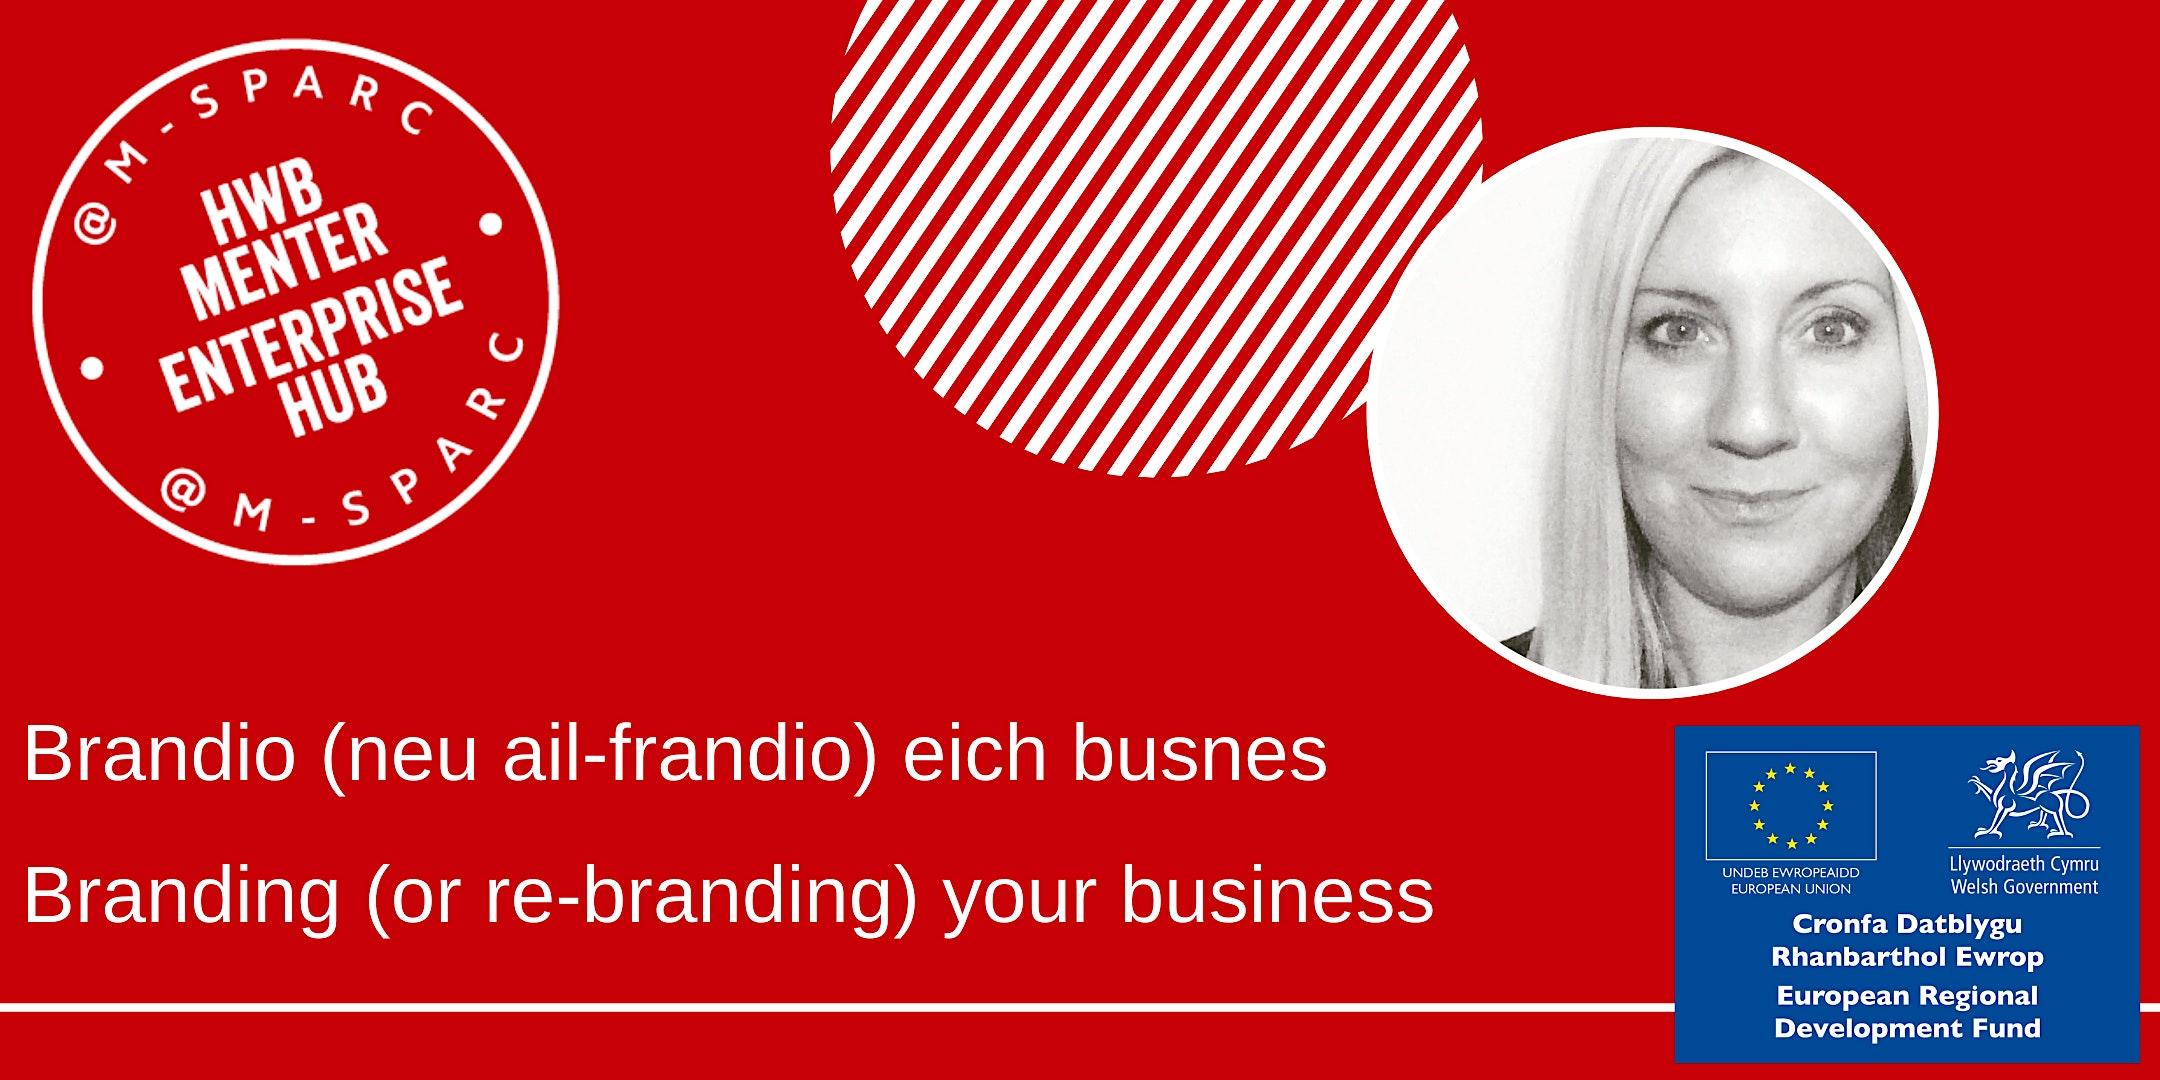 Covid-19:  Brandio eich busnes / Branding your business